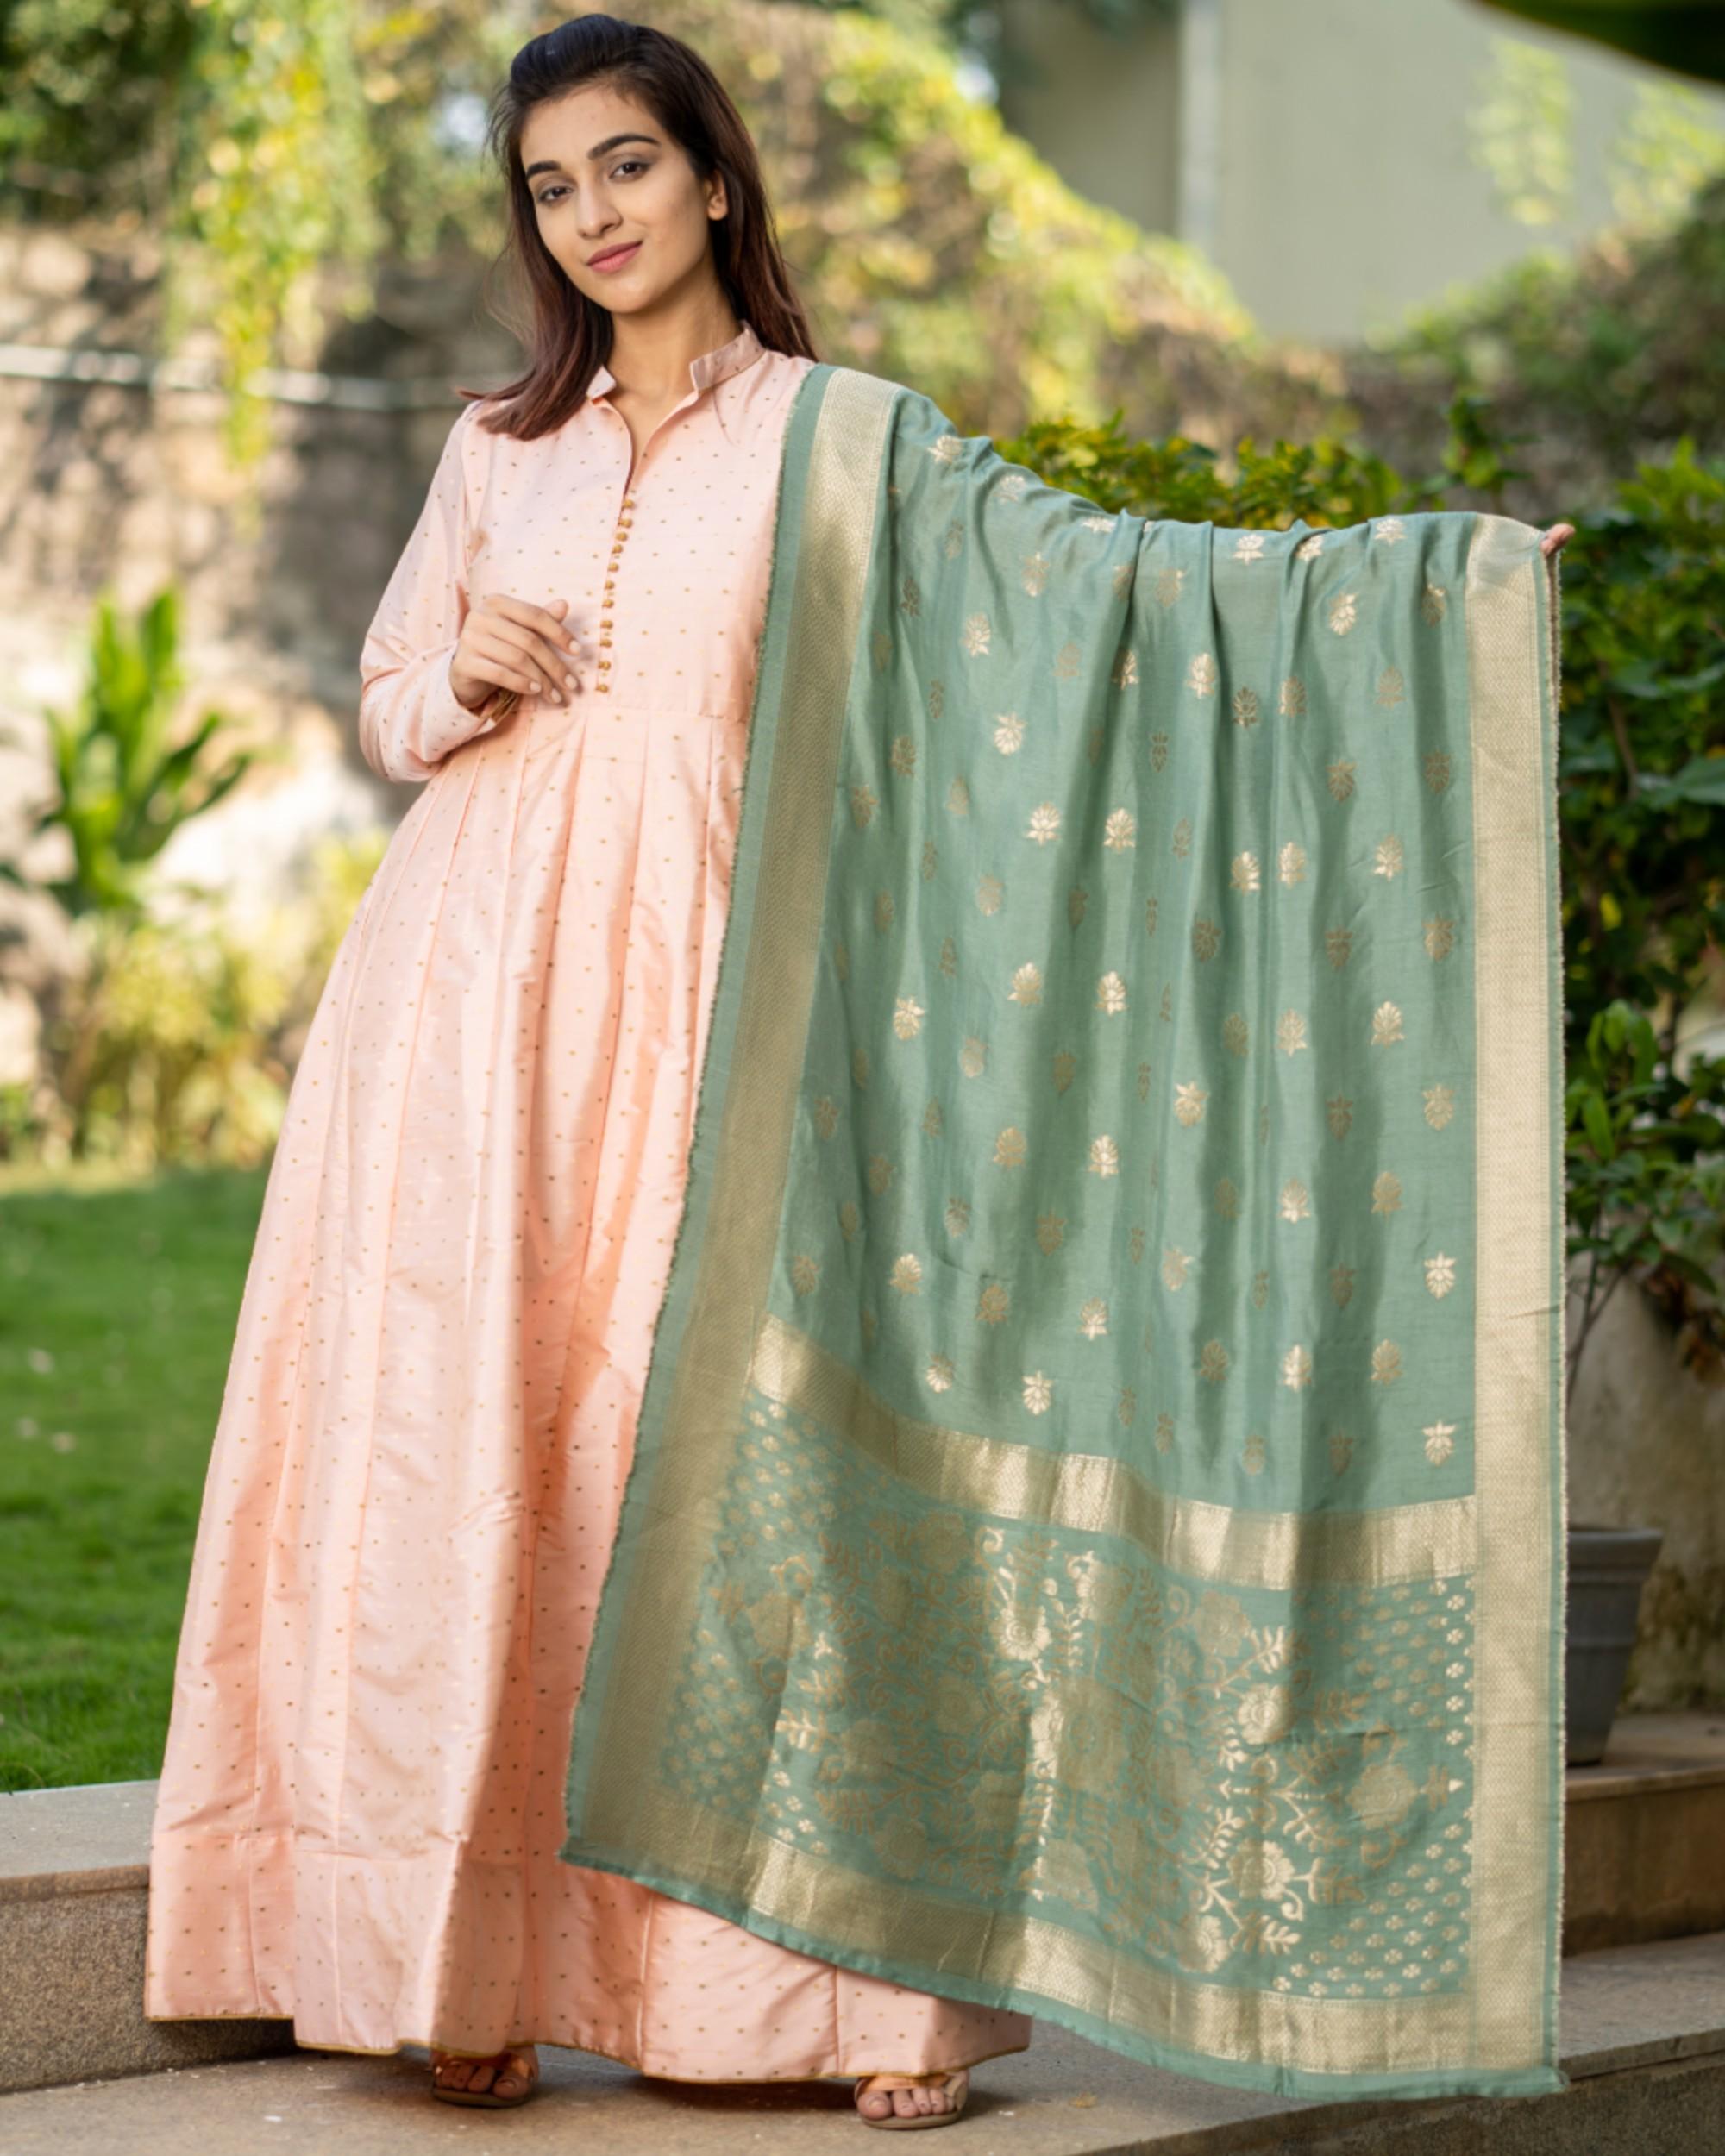 Pastel peach paneled dress with banarasi dupatta- set of two